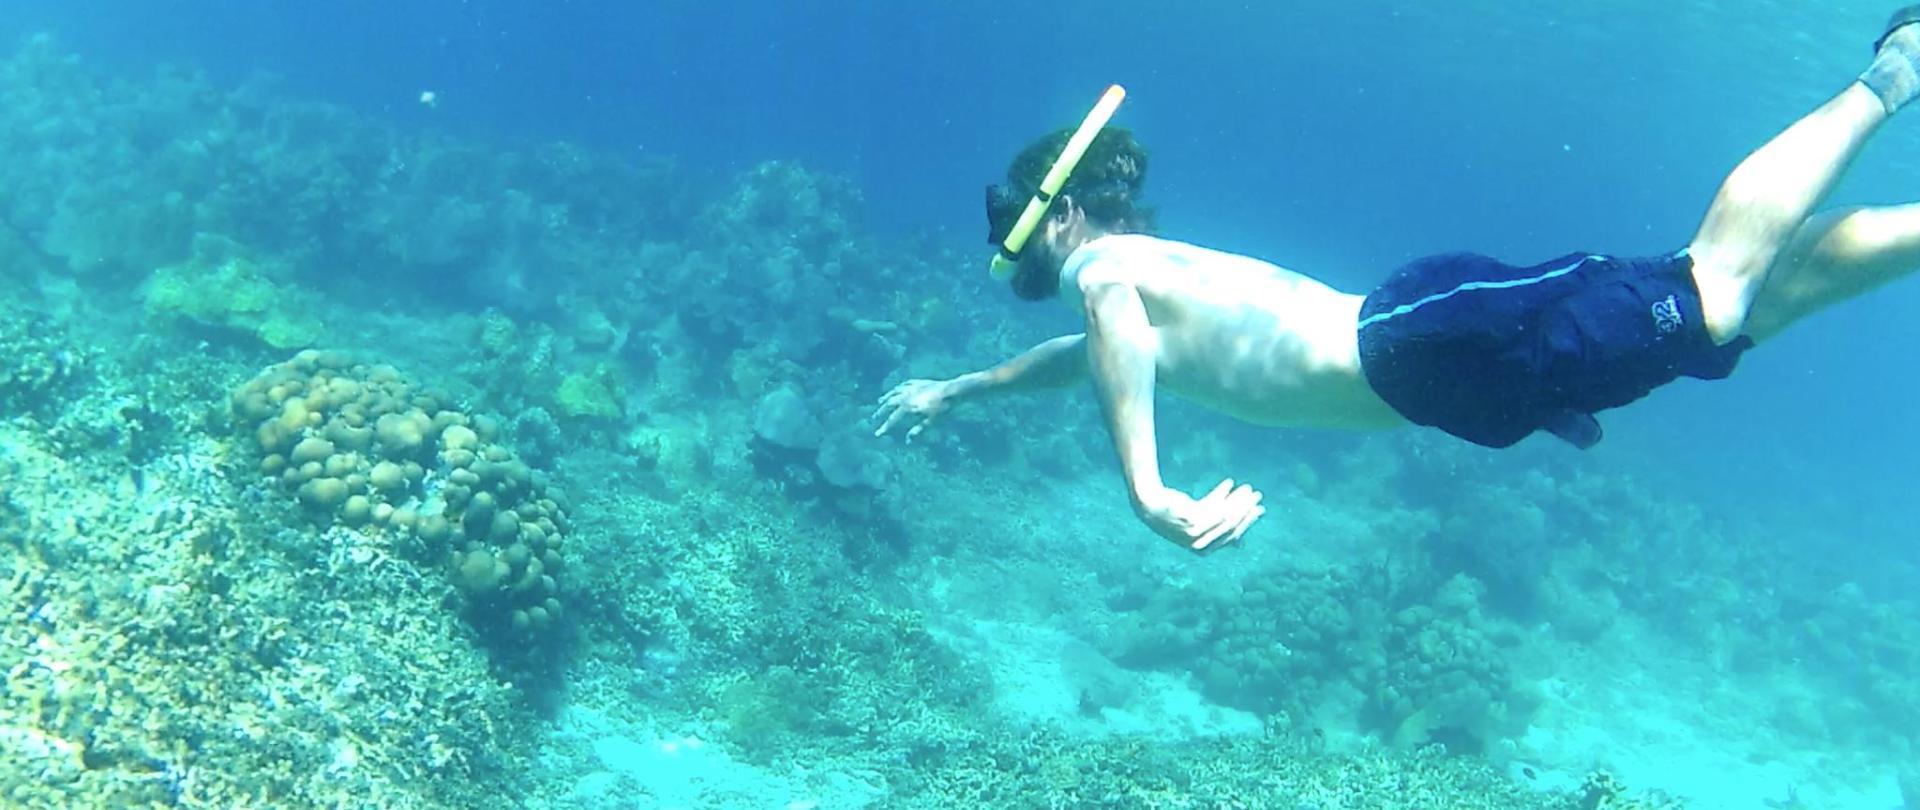 Snorkeling6.png